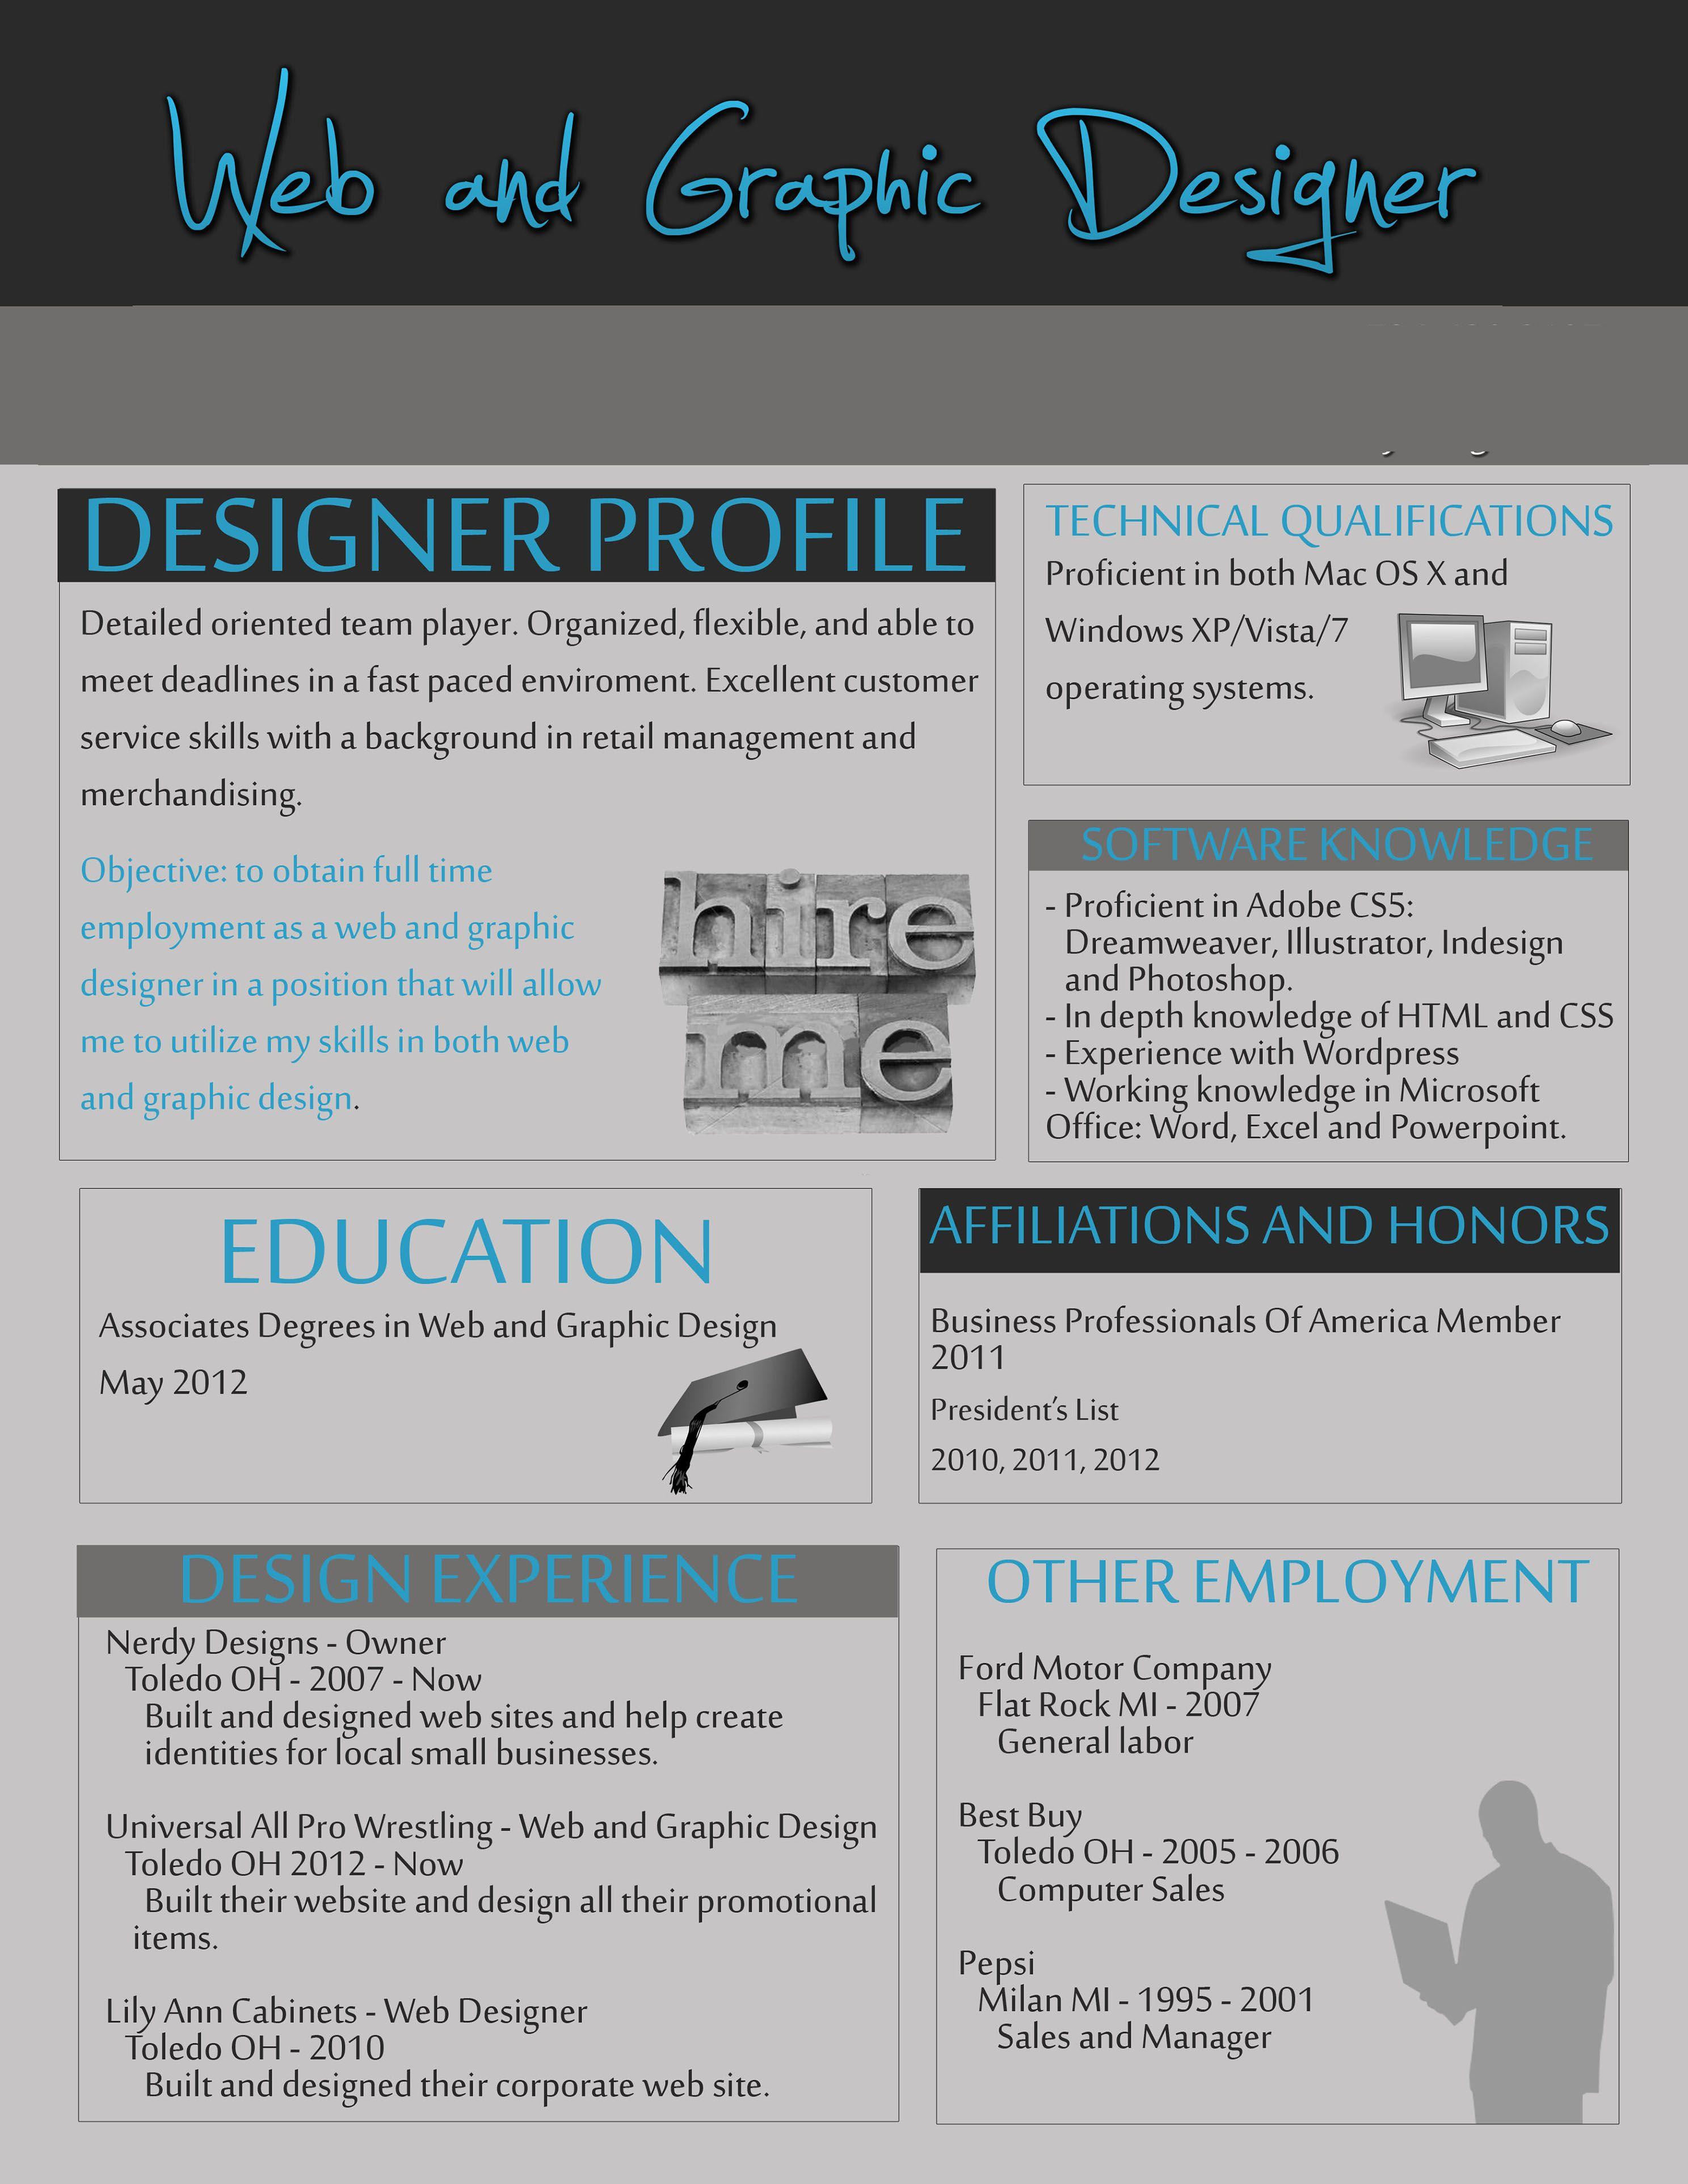 Graphic infographic graphic designer resume. http://www.nerdydesigns ...